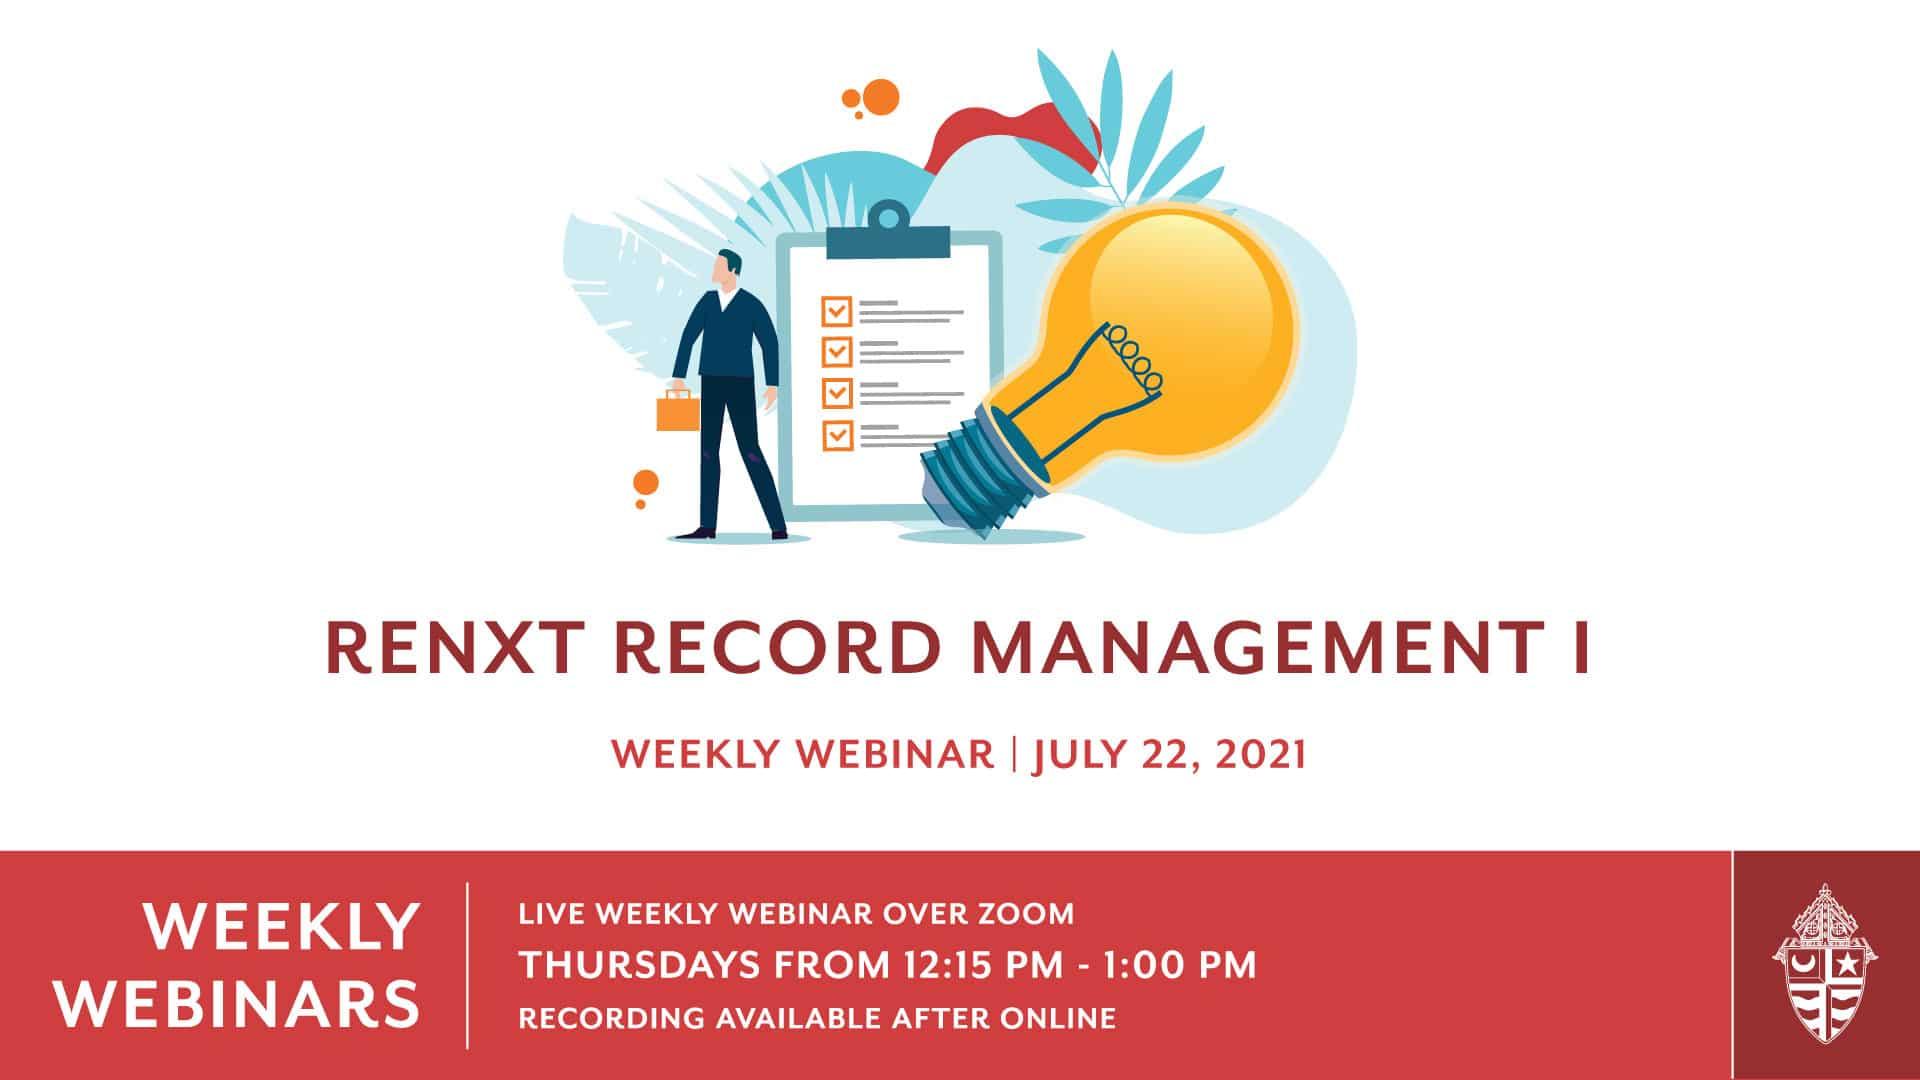 RENXT Record Management 1